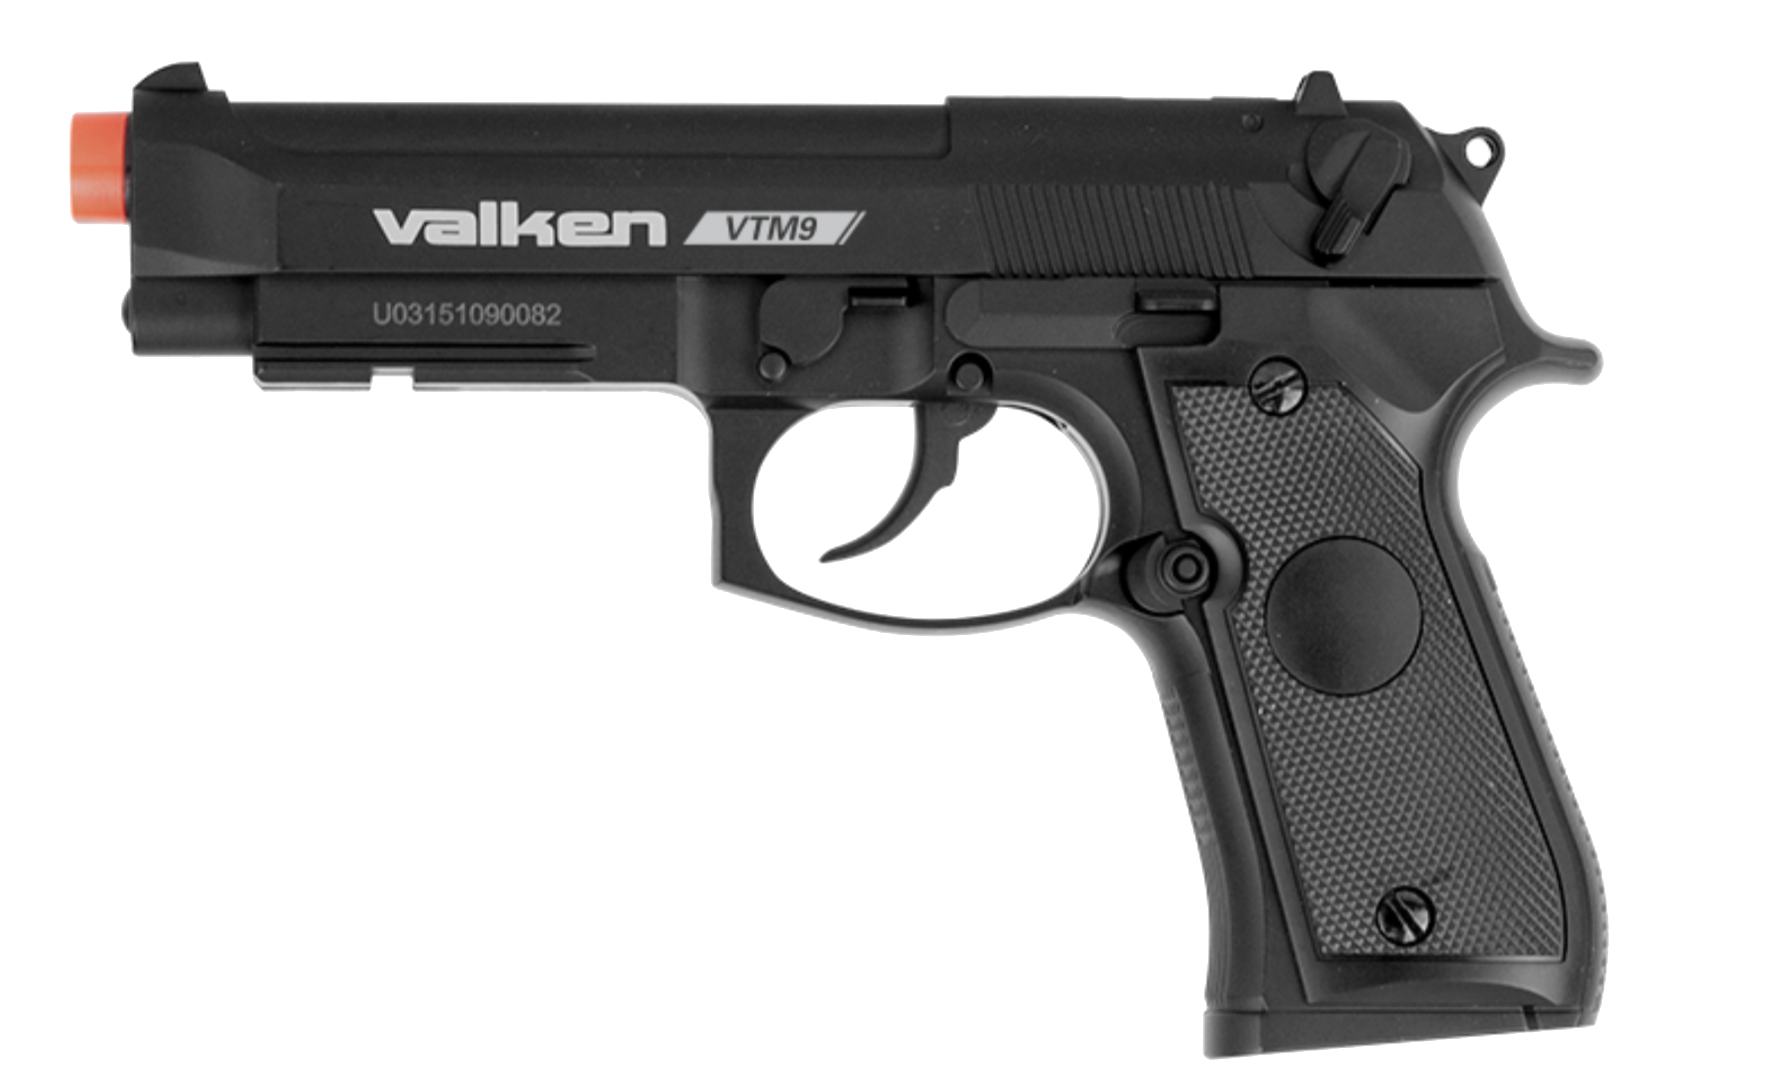 Pistola Valken de polmero VTM9